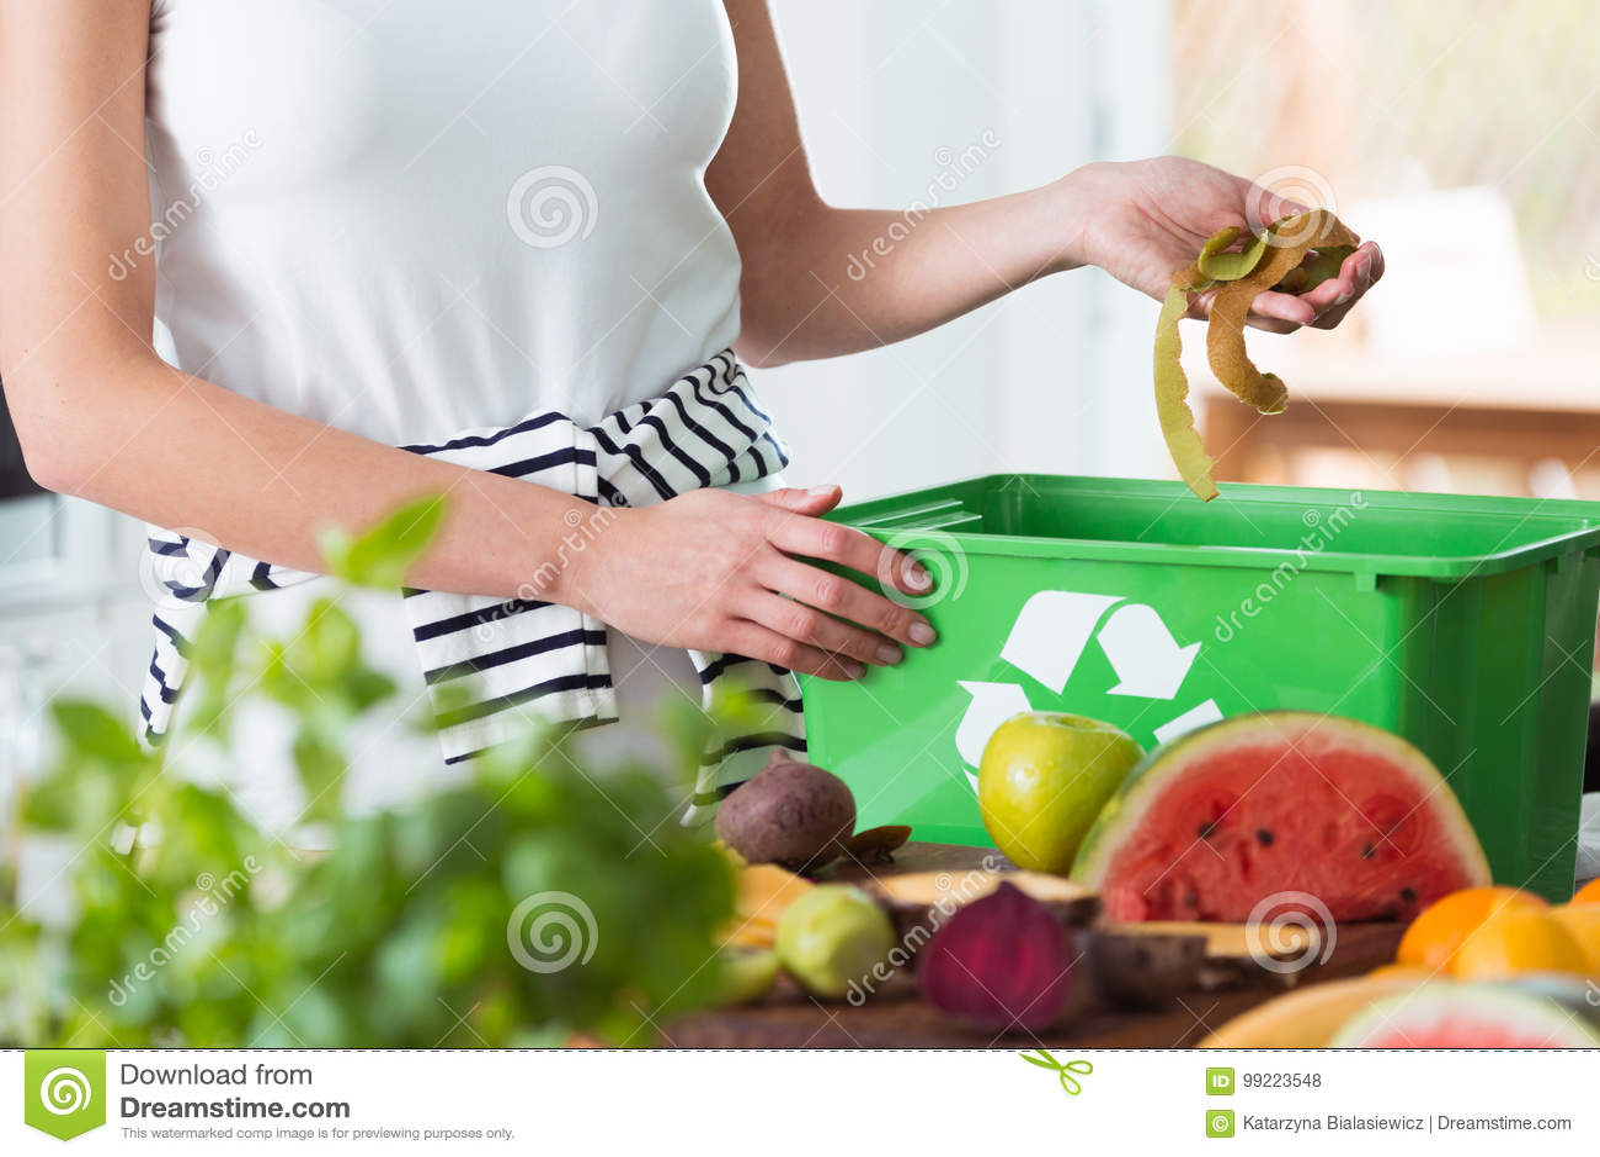 kitchen compost container kohler faucet parts 堆肥有机厨房废物的妇女库存照片 图片包括有绿色 概念 申请人 室内 回收有机厨房废物的妇女通过堆肥在绿色容器在膳食的准备时